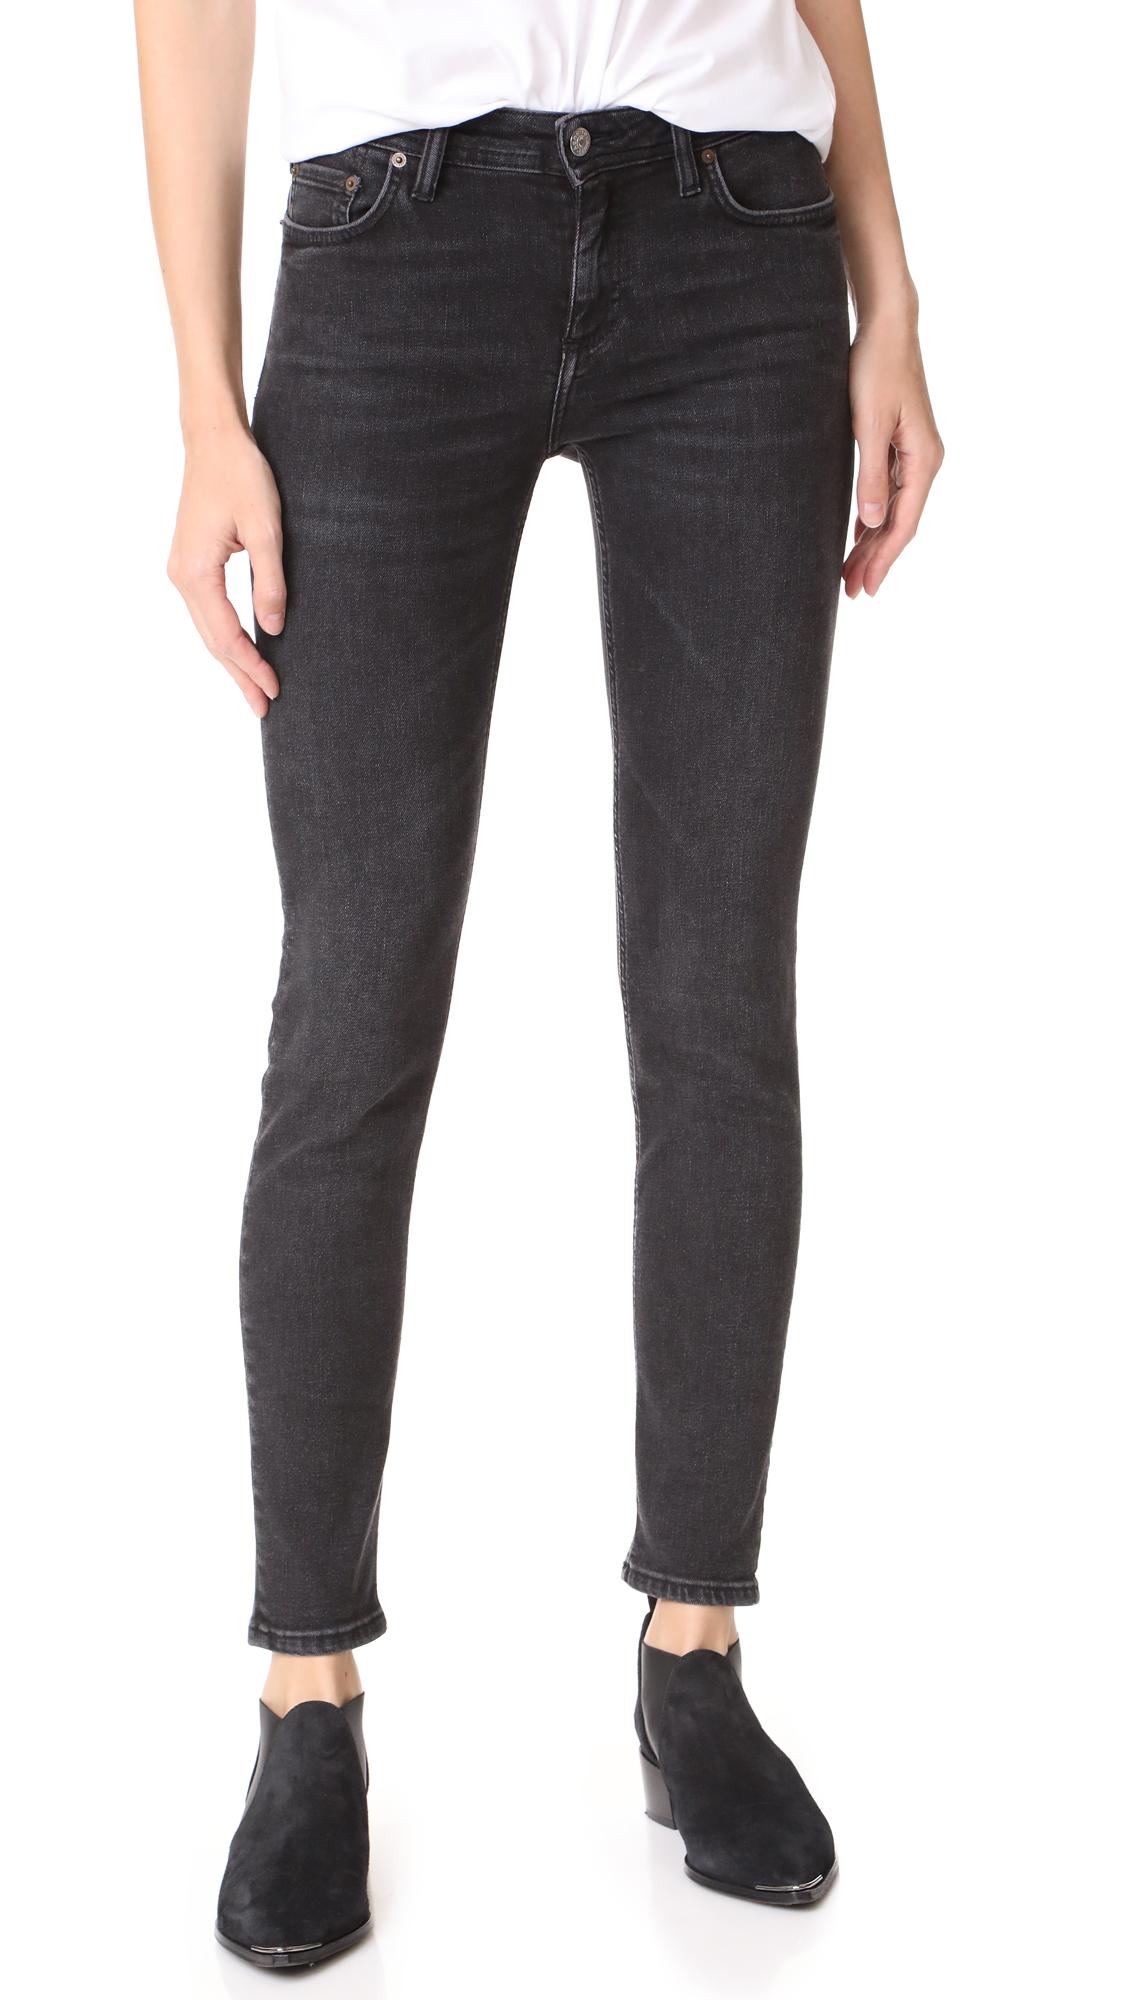 Acne Studios Climb Jeans - Used Black